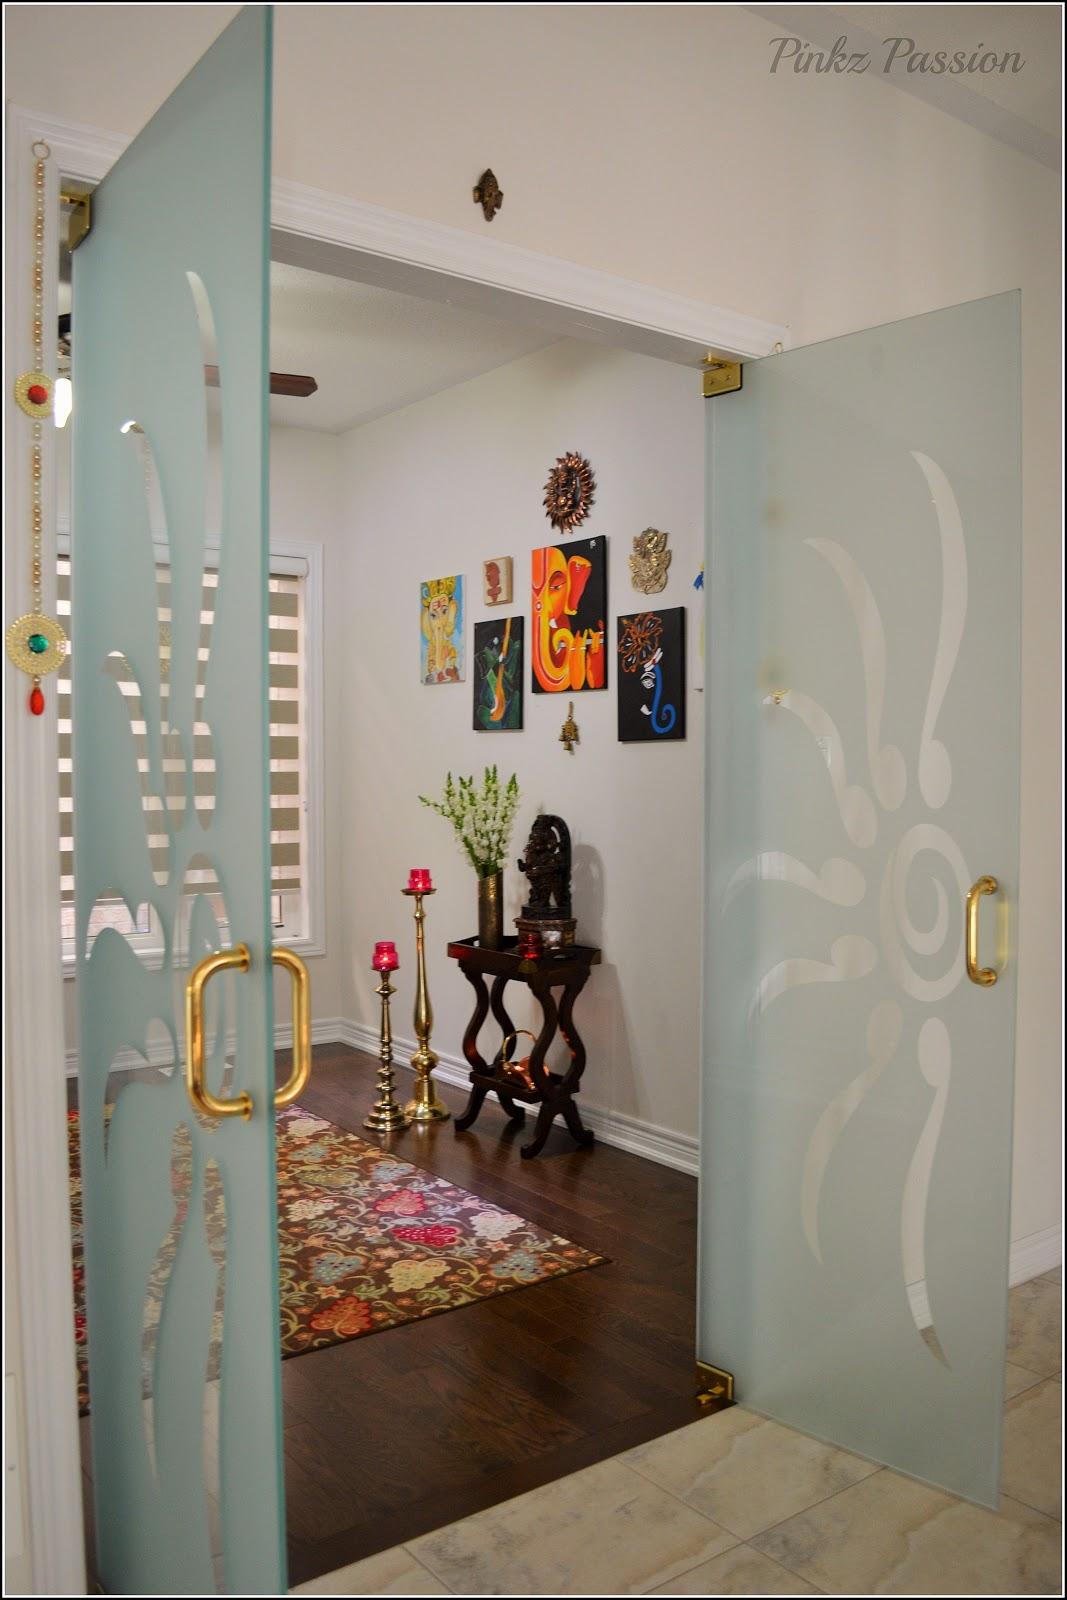 Pinkz Passion : A Zone of Serenity ( Pooja Room)